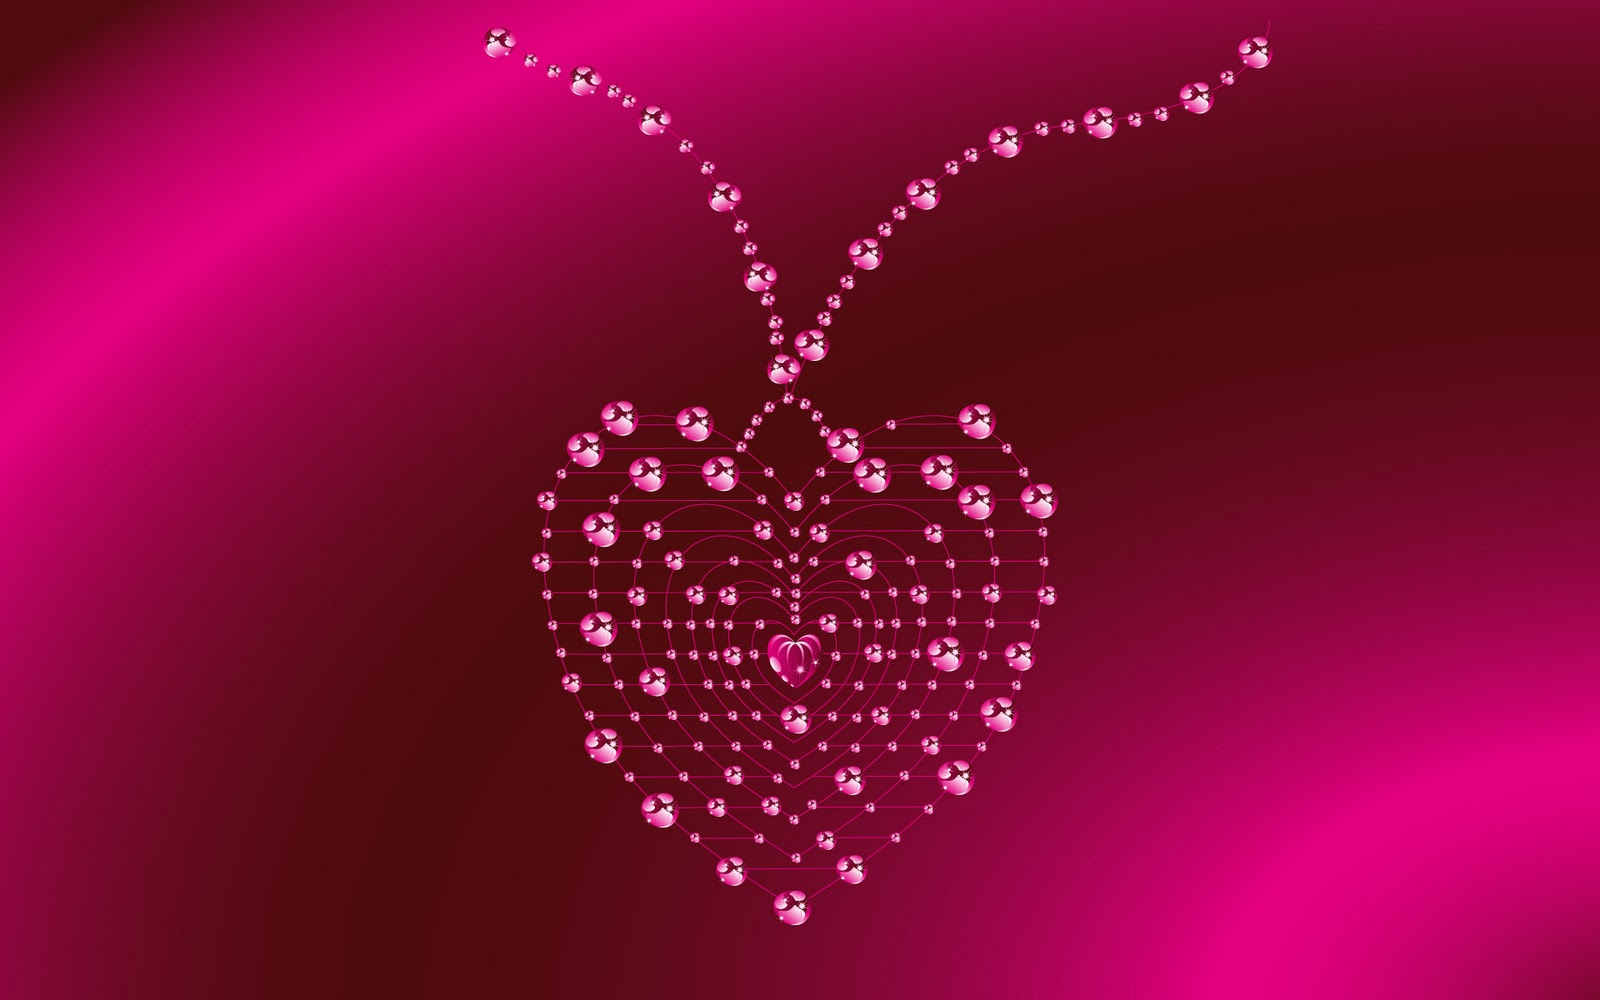 http://2.bp.blogspot.com/-9VCbO52Sw8A/T_3ToK_O2MI/AAAAAAAAAuE/V0X-f6NugMs/s1600/Dollar+Heart+HD+Wallpaper.jpg